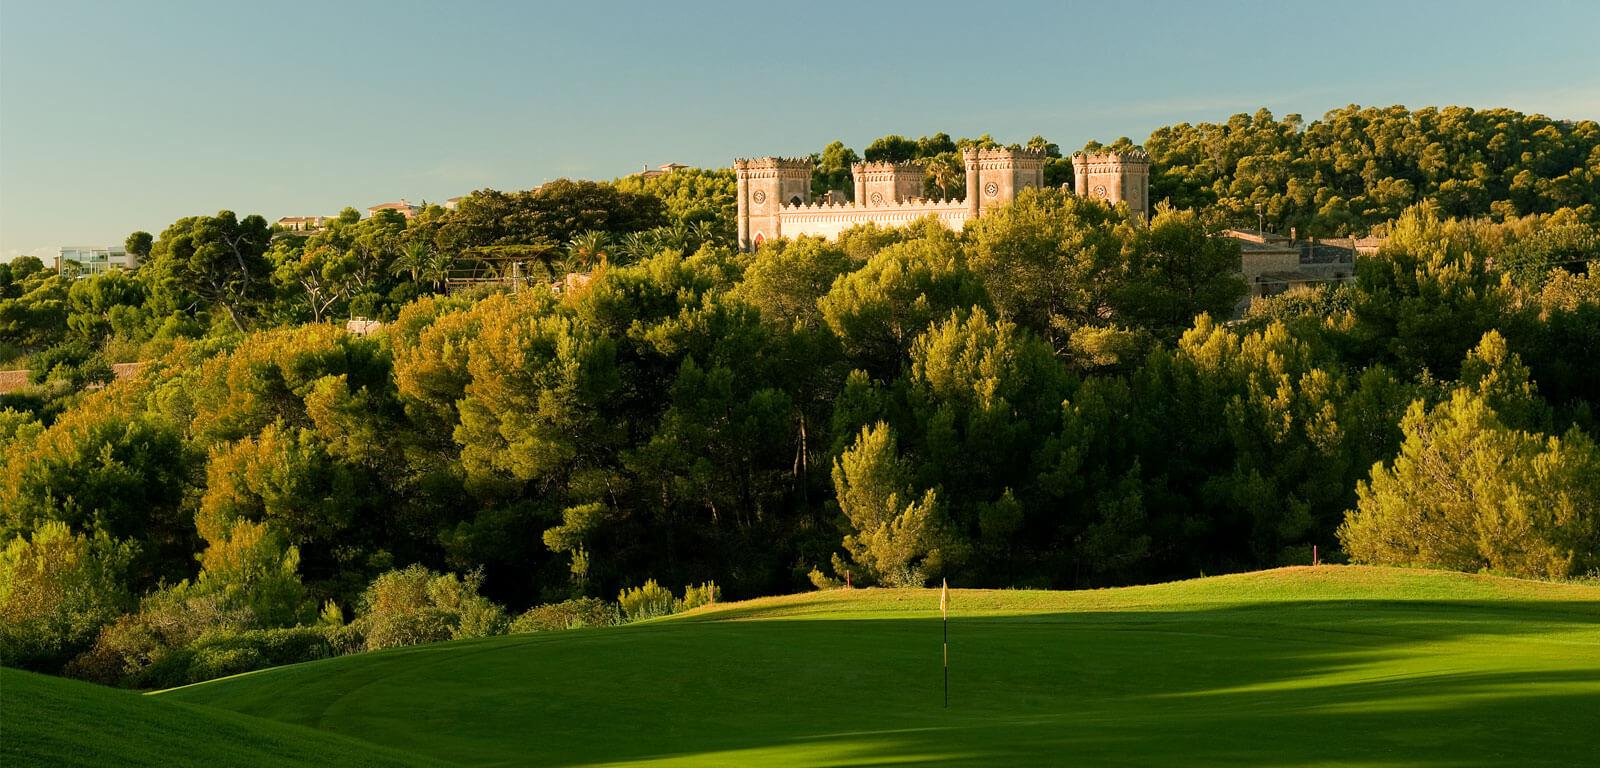 Golf de bendinat, golf, Mallorca, Bendinat, Mallorca